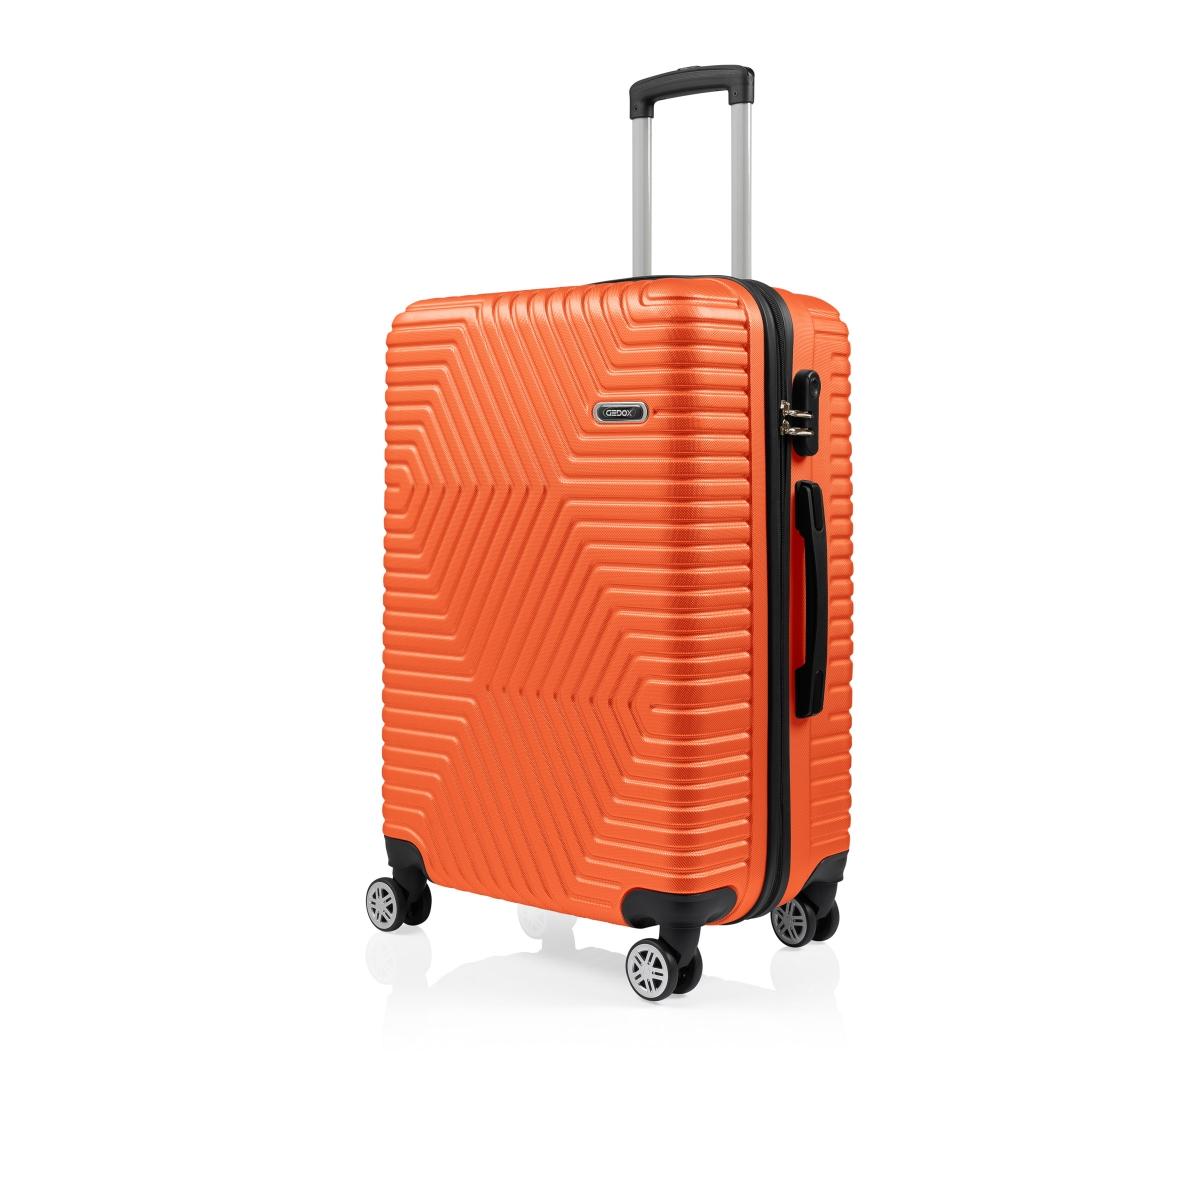 G&D Polo Suitcase ABS 3'lü Lüx Valiz Seyahat Seti - Model:600.15 Turuncu